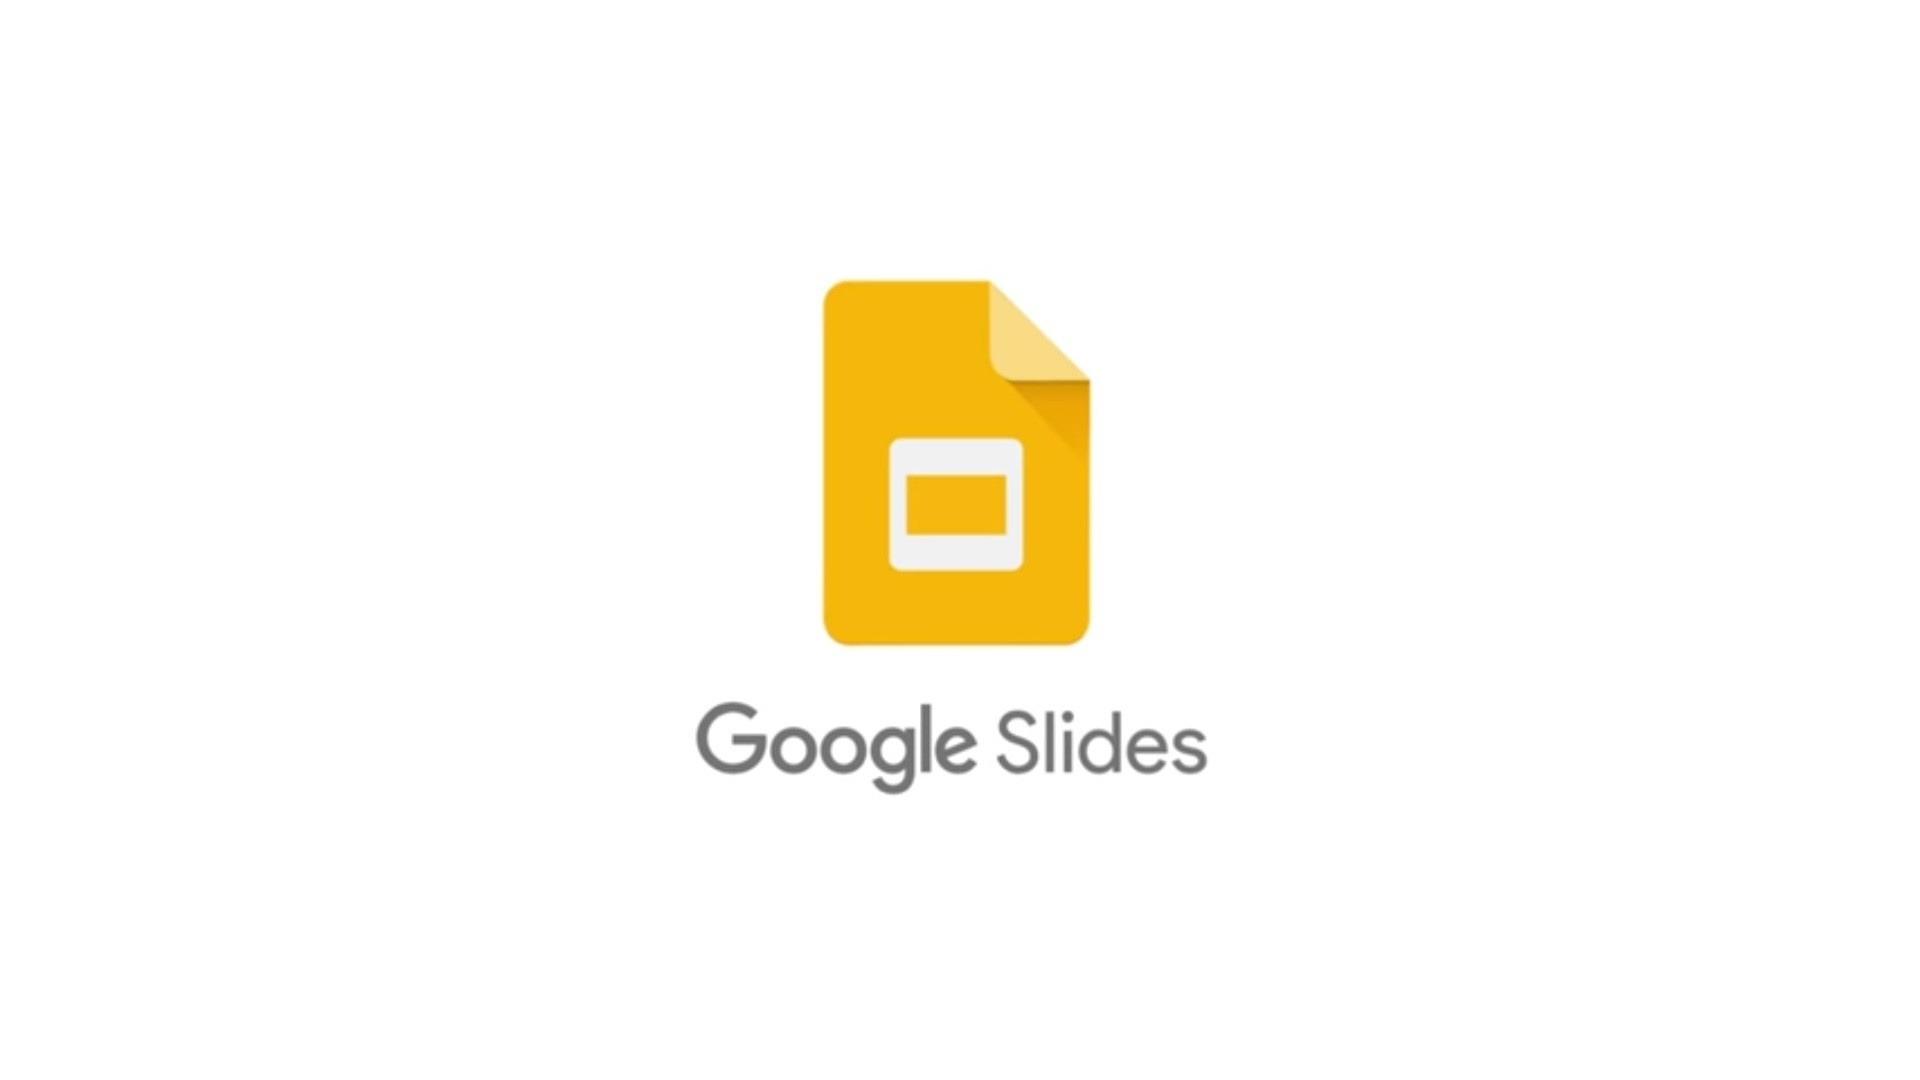 برنامه گوگل اسلاید - Google Slides ؛ اپلیکیشن پاورپوینت اندروید | رسانه چیکاو